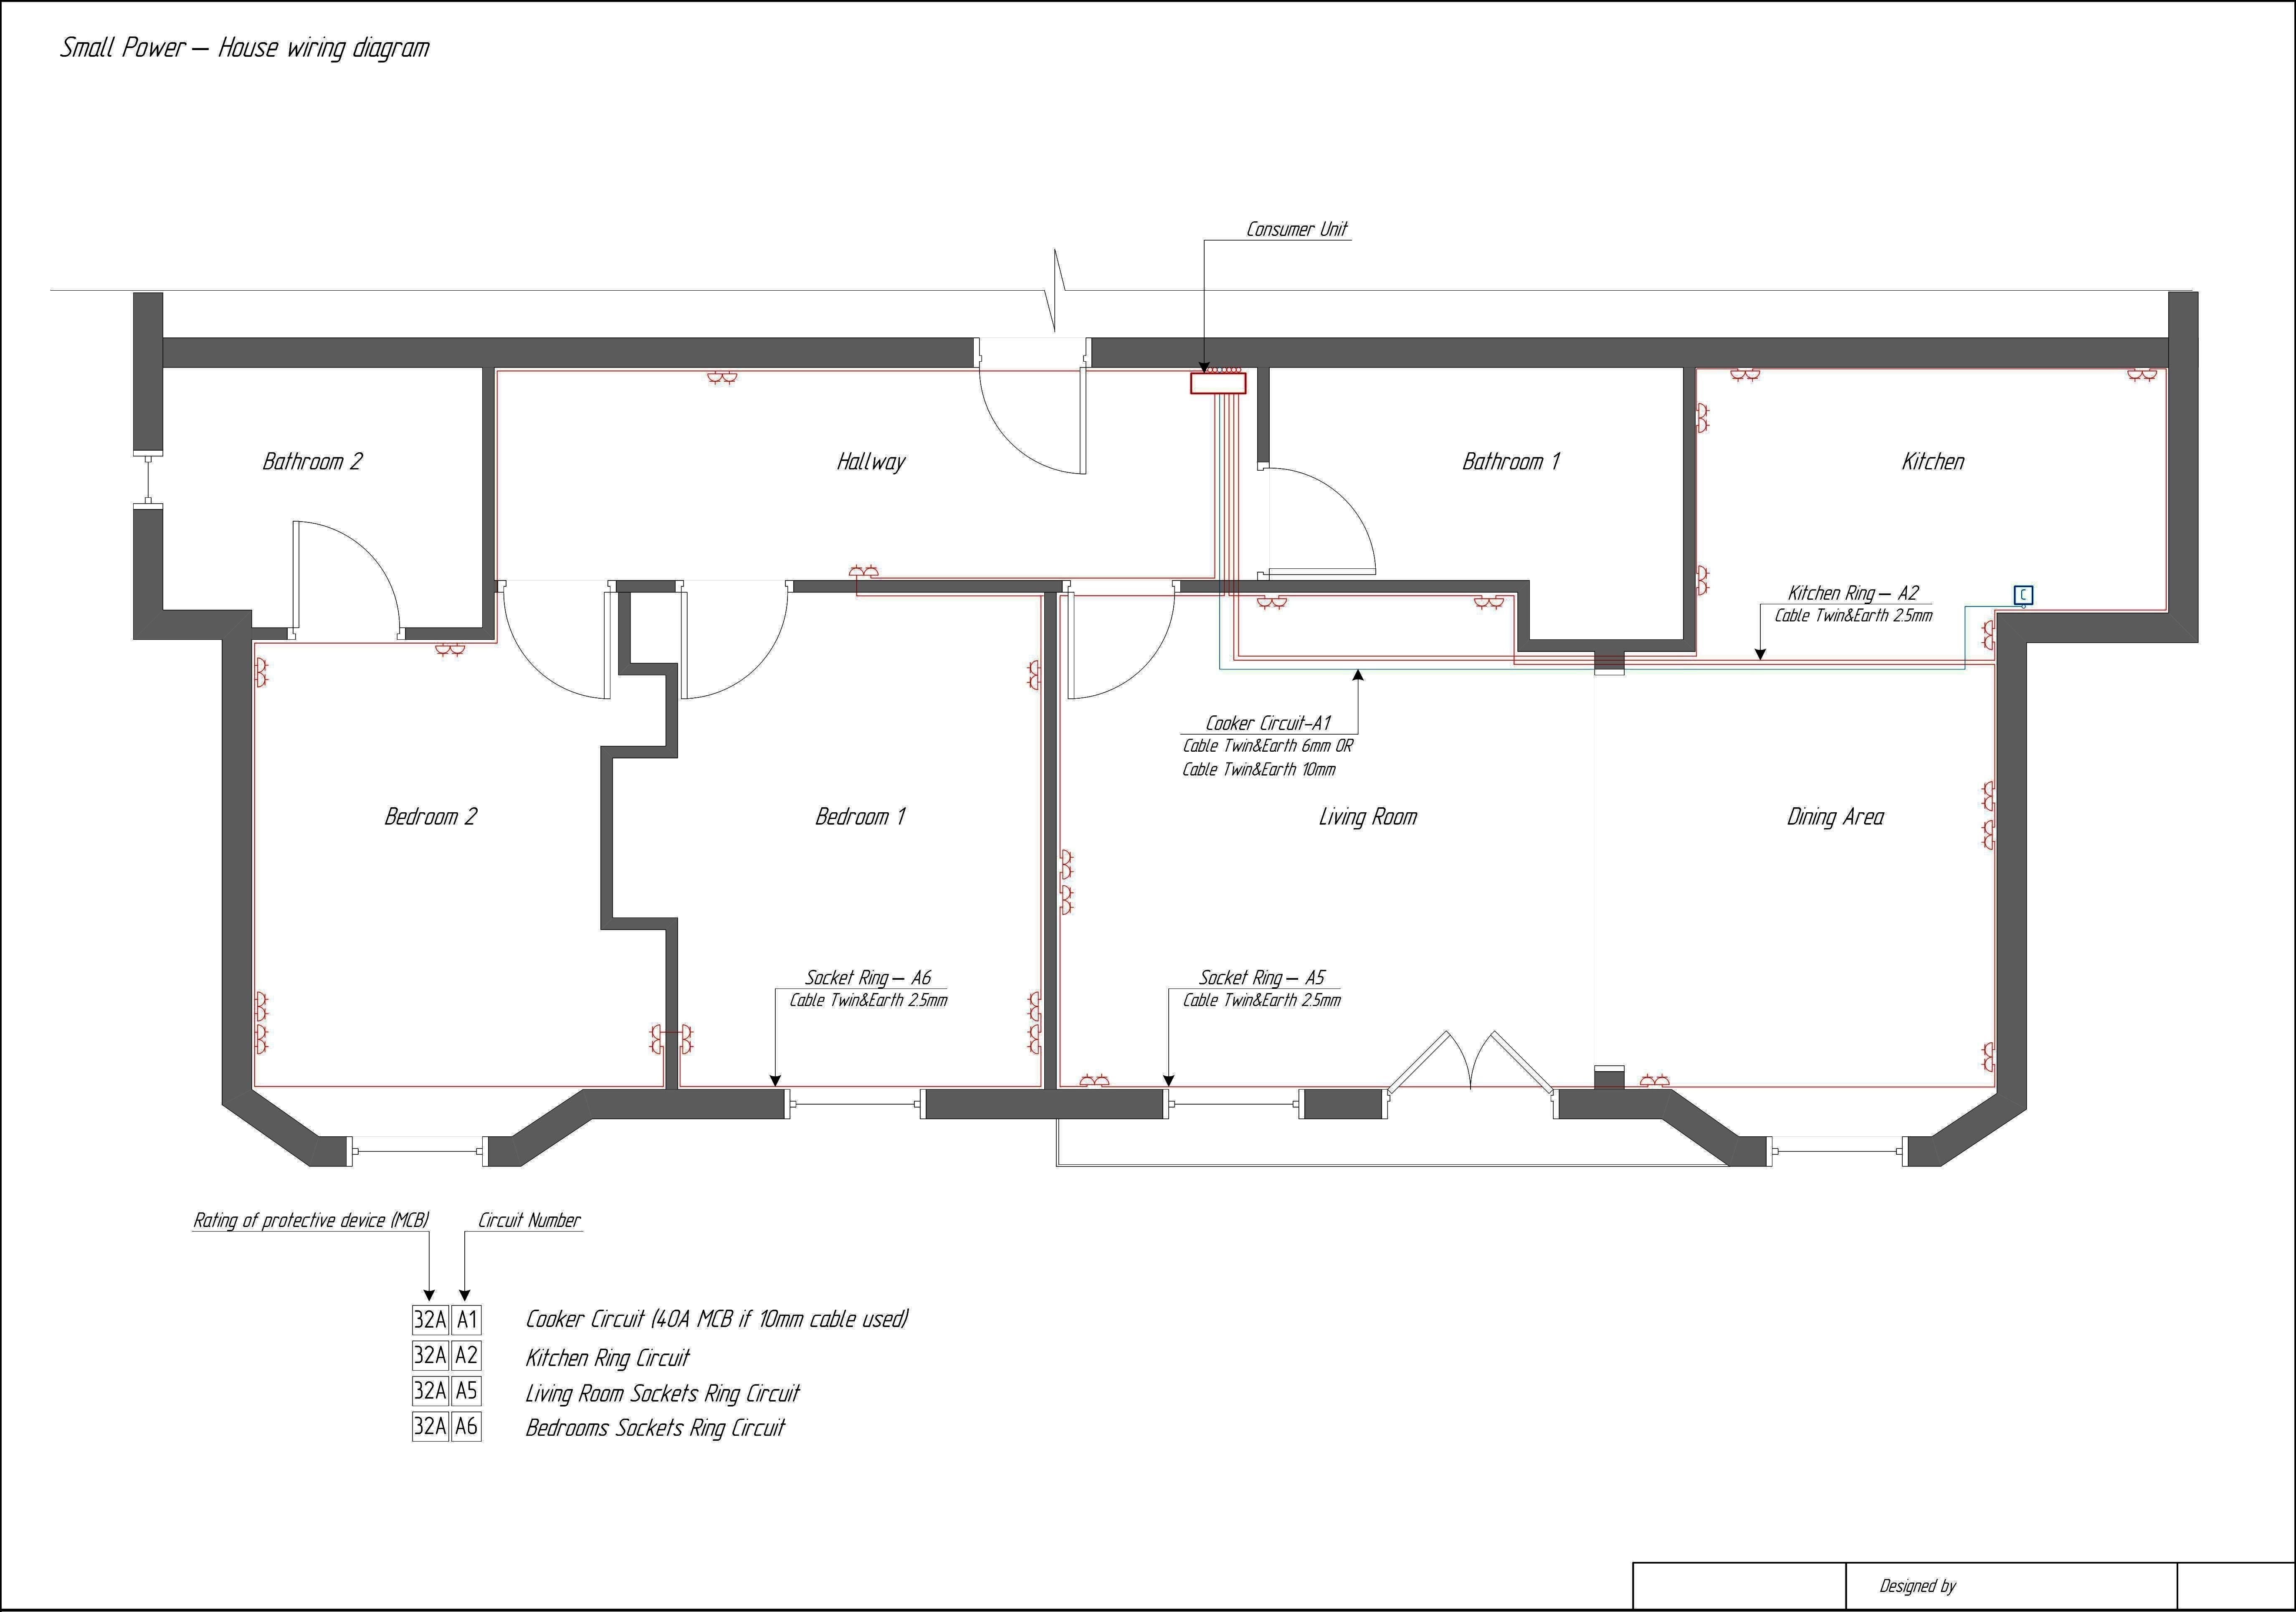 New House Electrical Wiring Basics Diagram Wiringdiagram